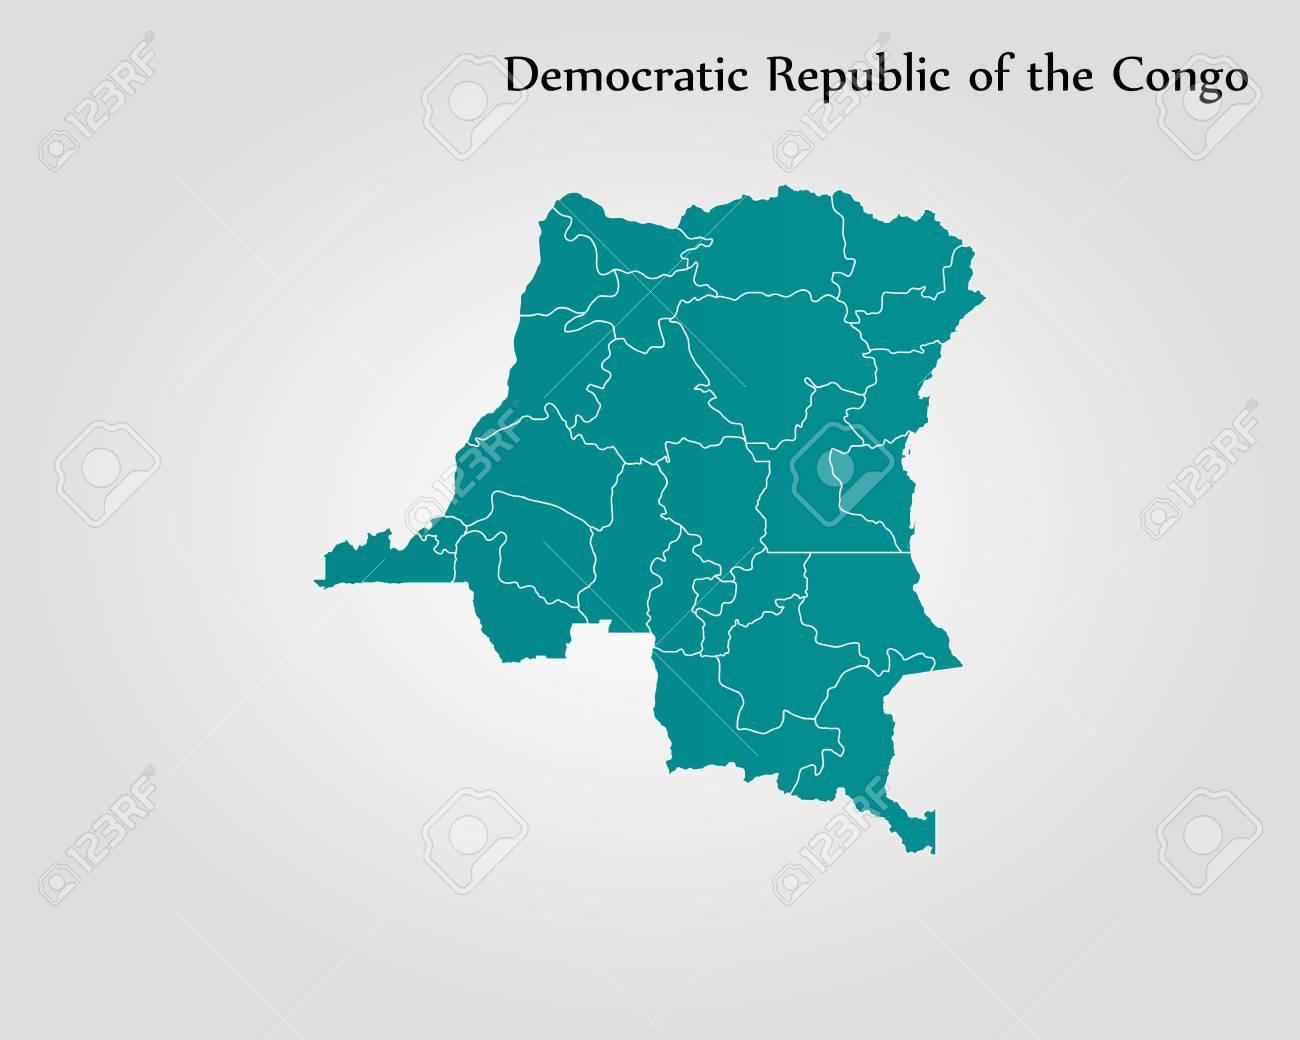 Democratic World Map.Map Of Democratic Republic Of The Congo Vector Illustration